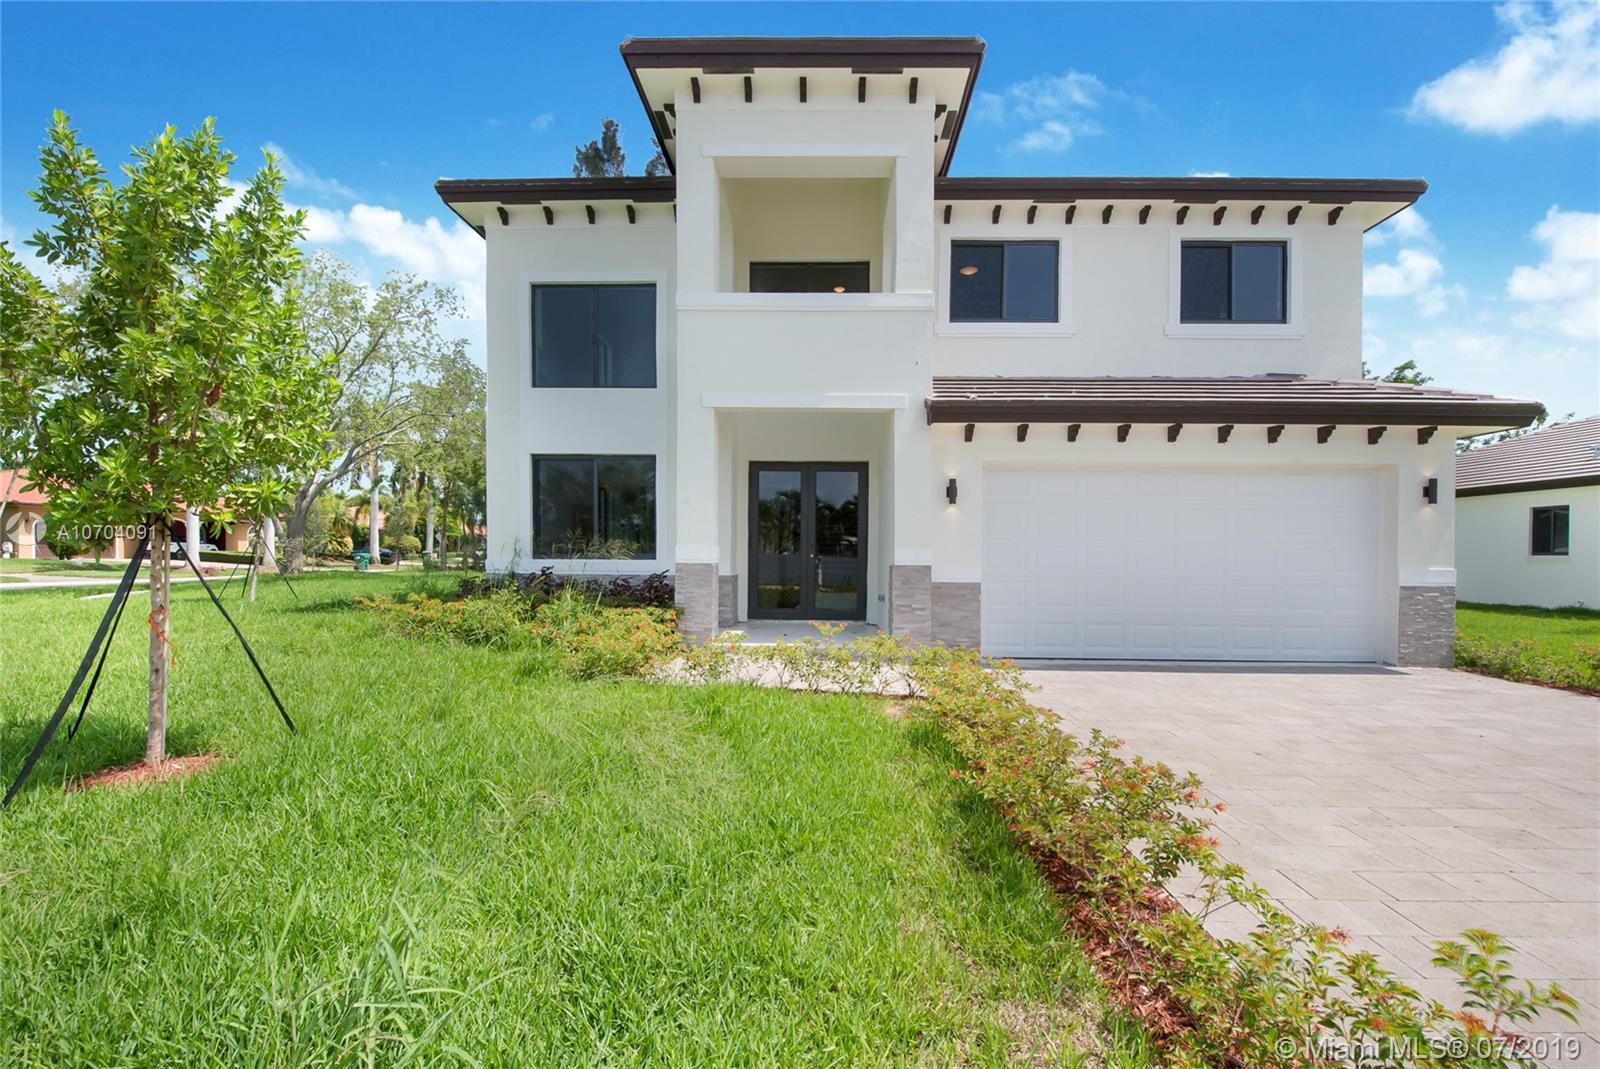 9200 SW 170th St, Palmetto Bay, FL 33157